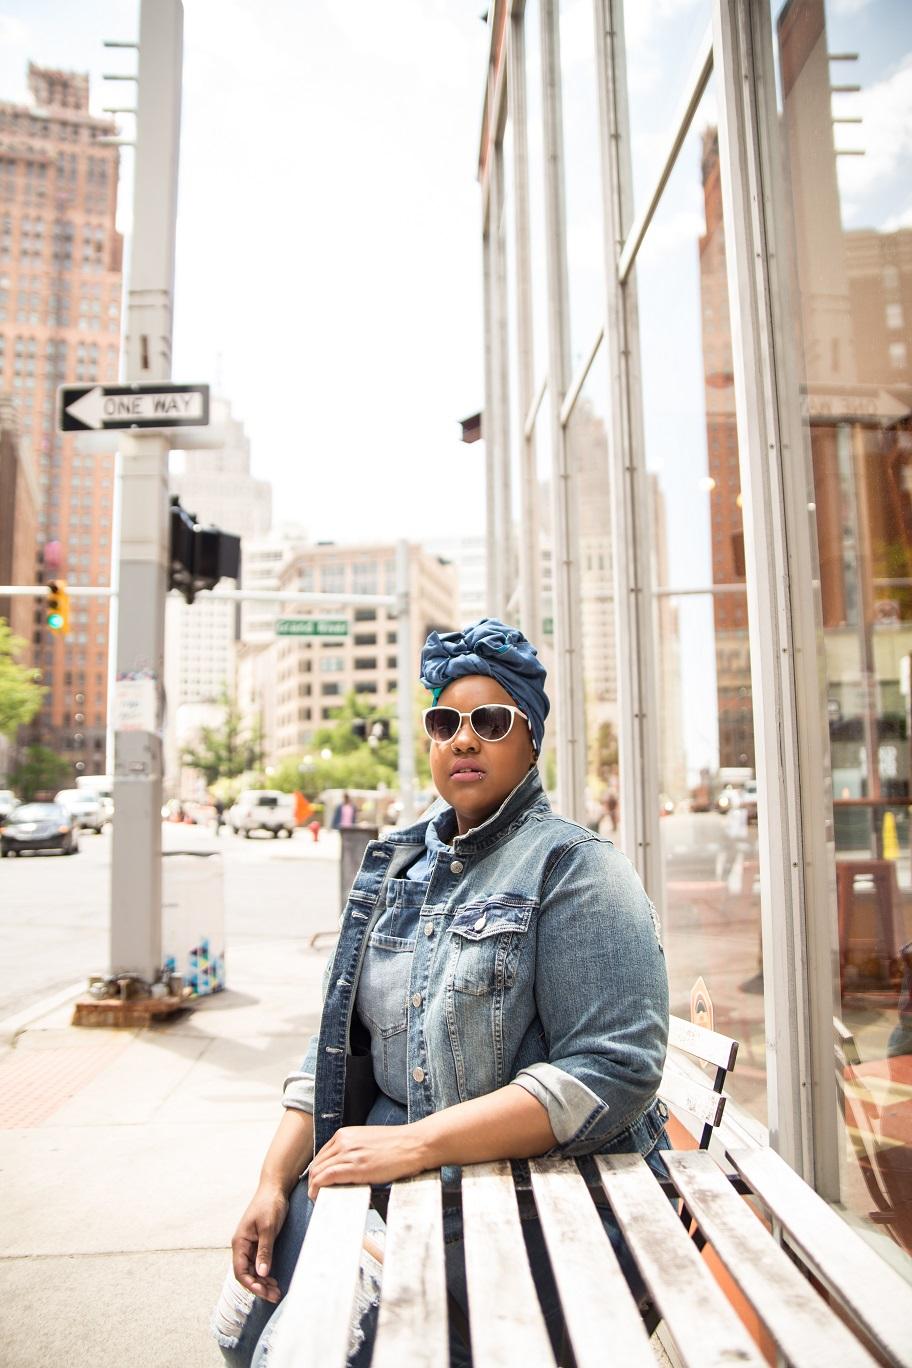 Leah-Vernon-Plus-Size-Model-Detroit-Blogger-Muslim-Girl-Body-positive-1